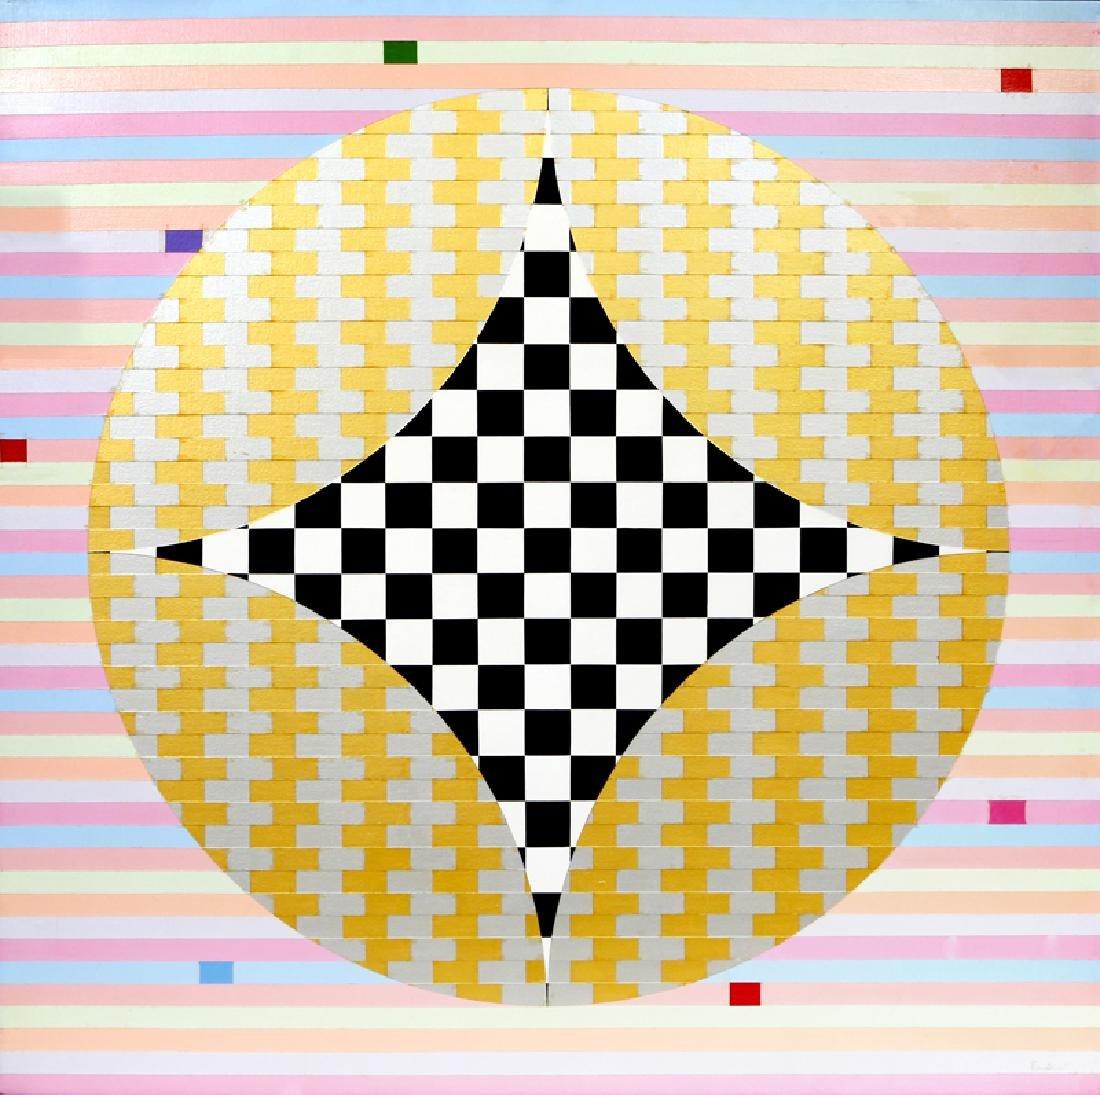 Max Epstein, Mosport Park, Acrylic Painting